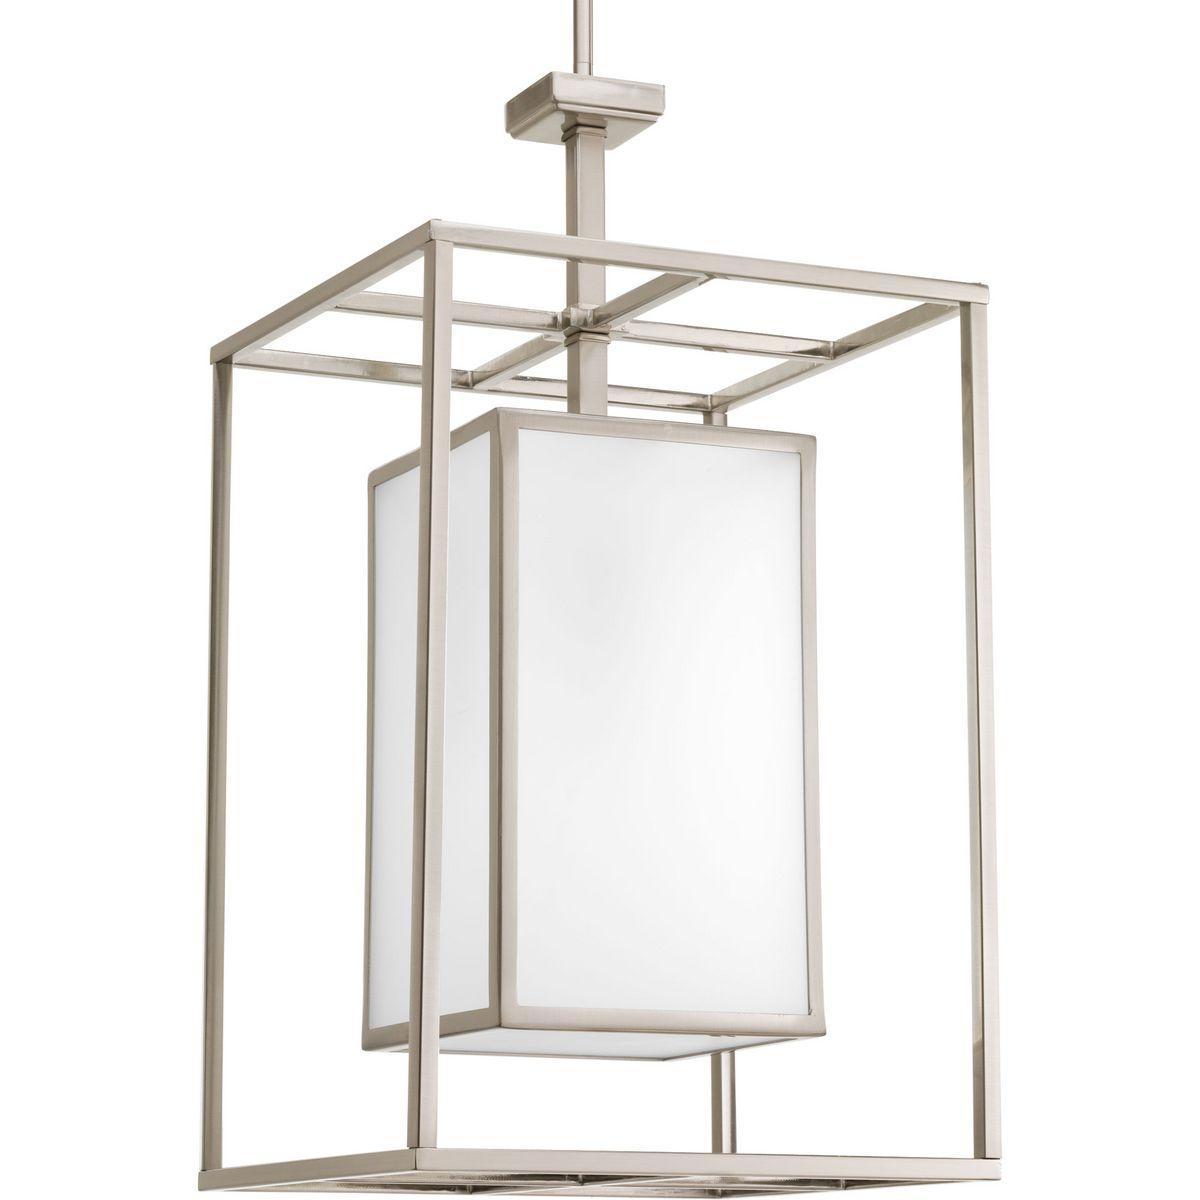 Haven one light foyer pendant chandeliers foyer pendants progp392109prodimage aloadofball Images